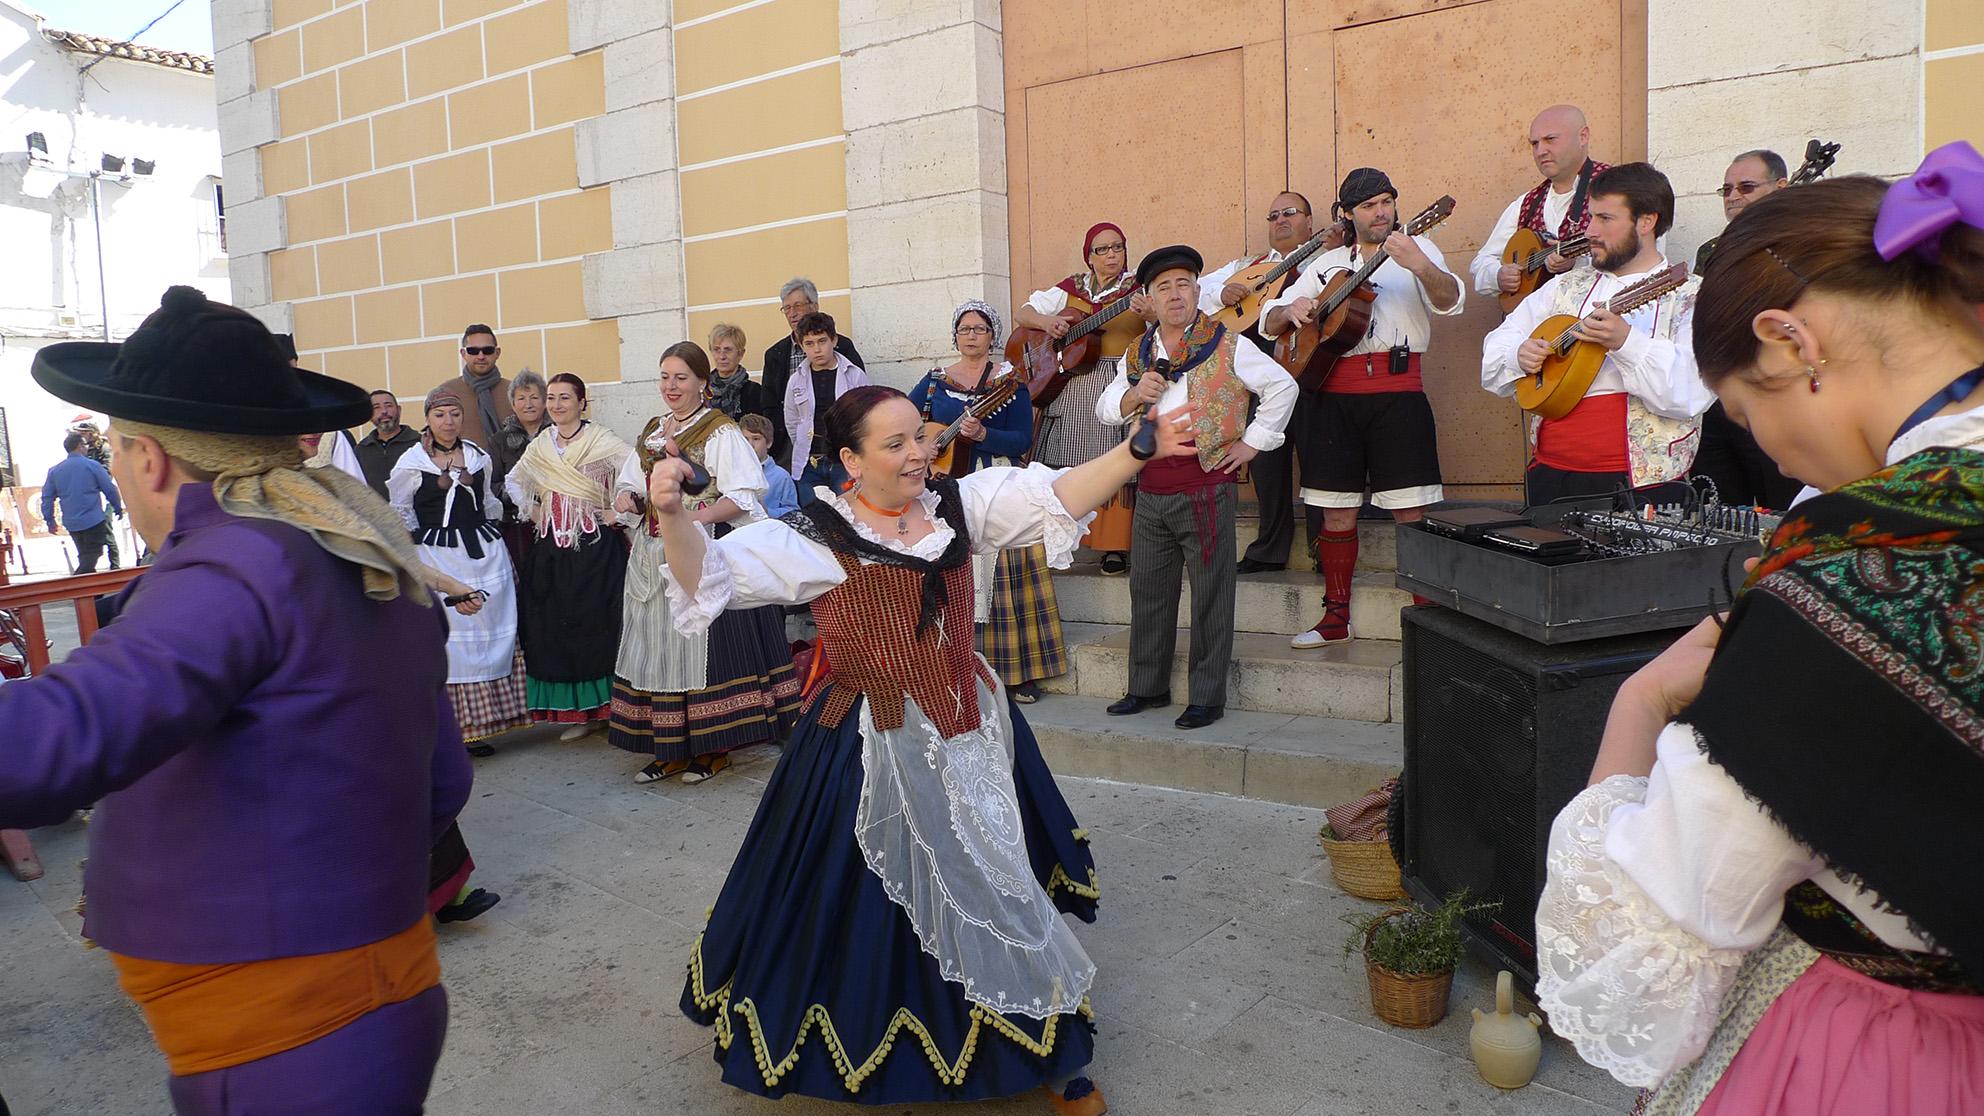 2014-02-23 - Baladre a Fira St. Marcia-ROTOVA (34)